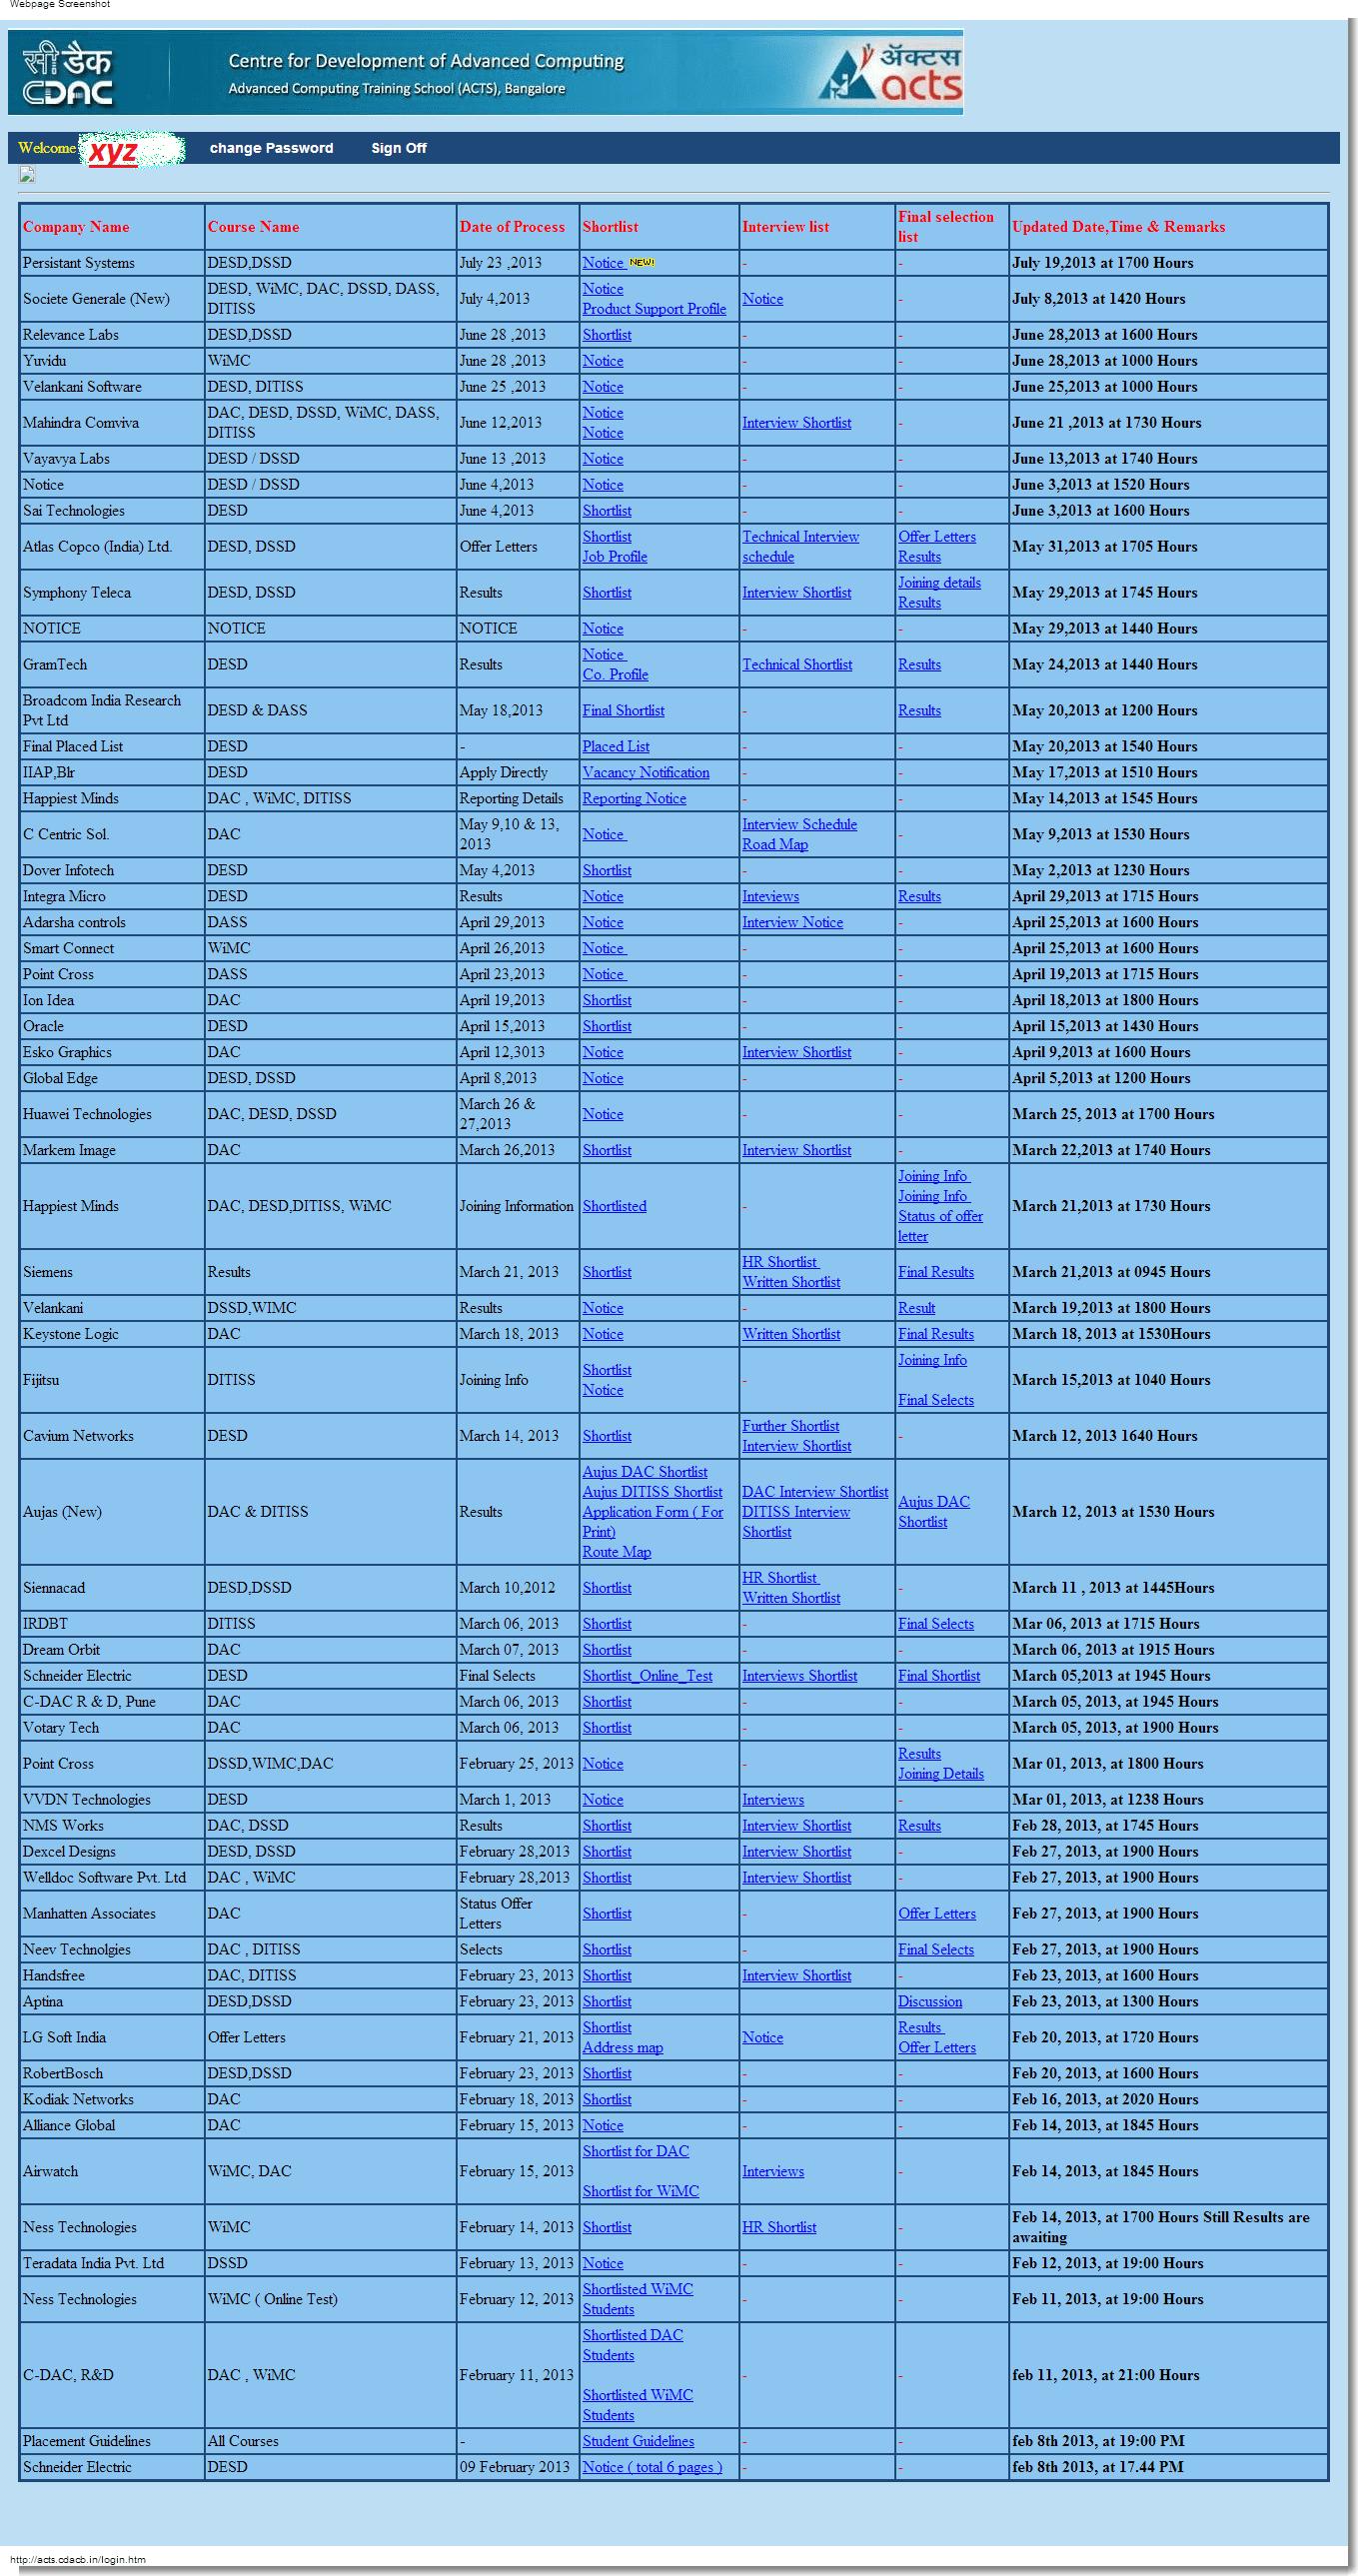 CDAC 2013 : Results + Ranks + Center Preferences